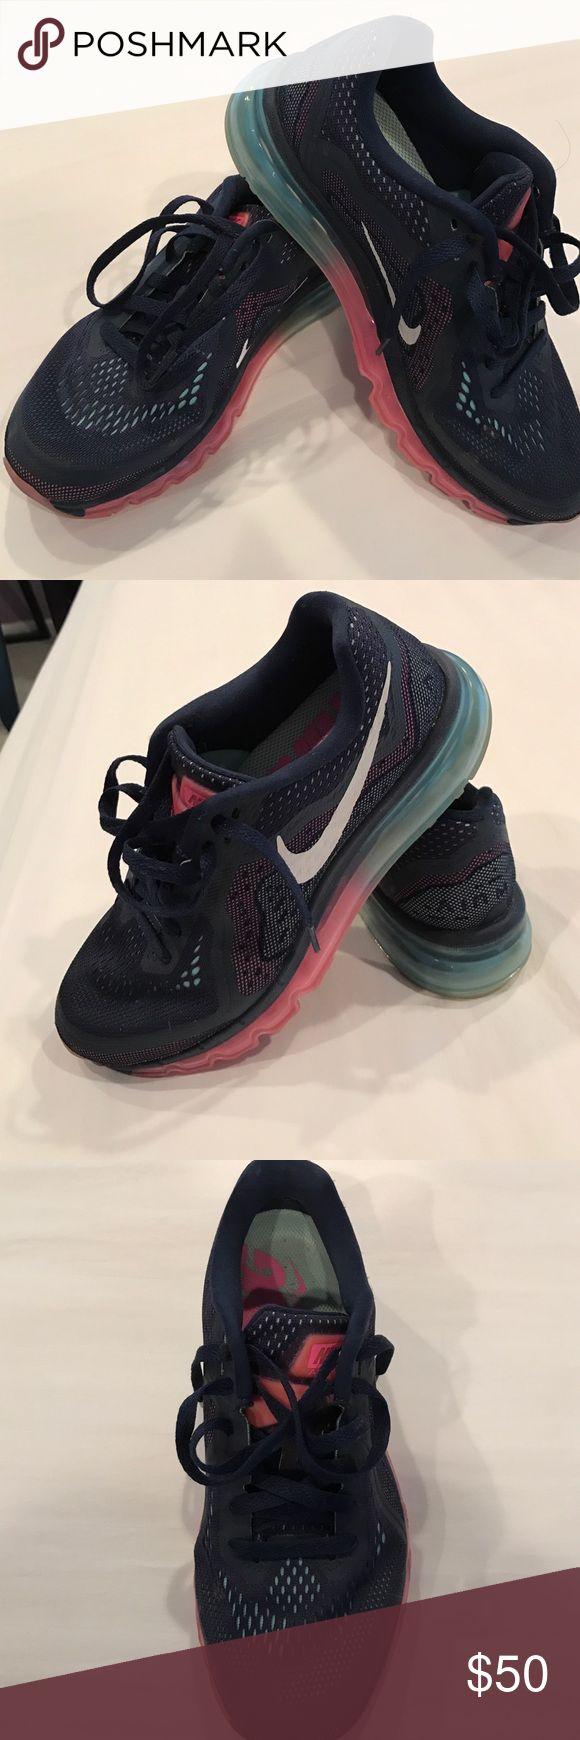 Nike Air Jordan 7 Retro, Zapatillas de Deporte para Hombre, Negro/Rojo/Gris (Blck/Unvrsty Rd-Grn Pls-Cl Gry-), 42 1/2 EU